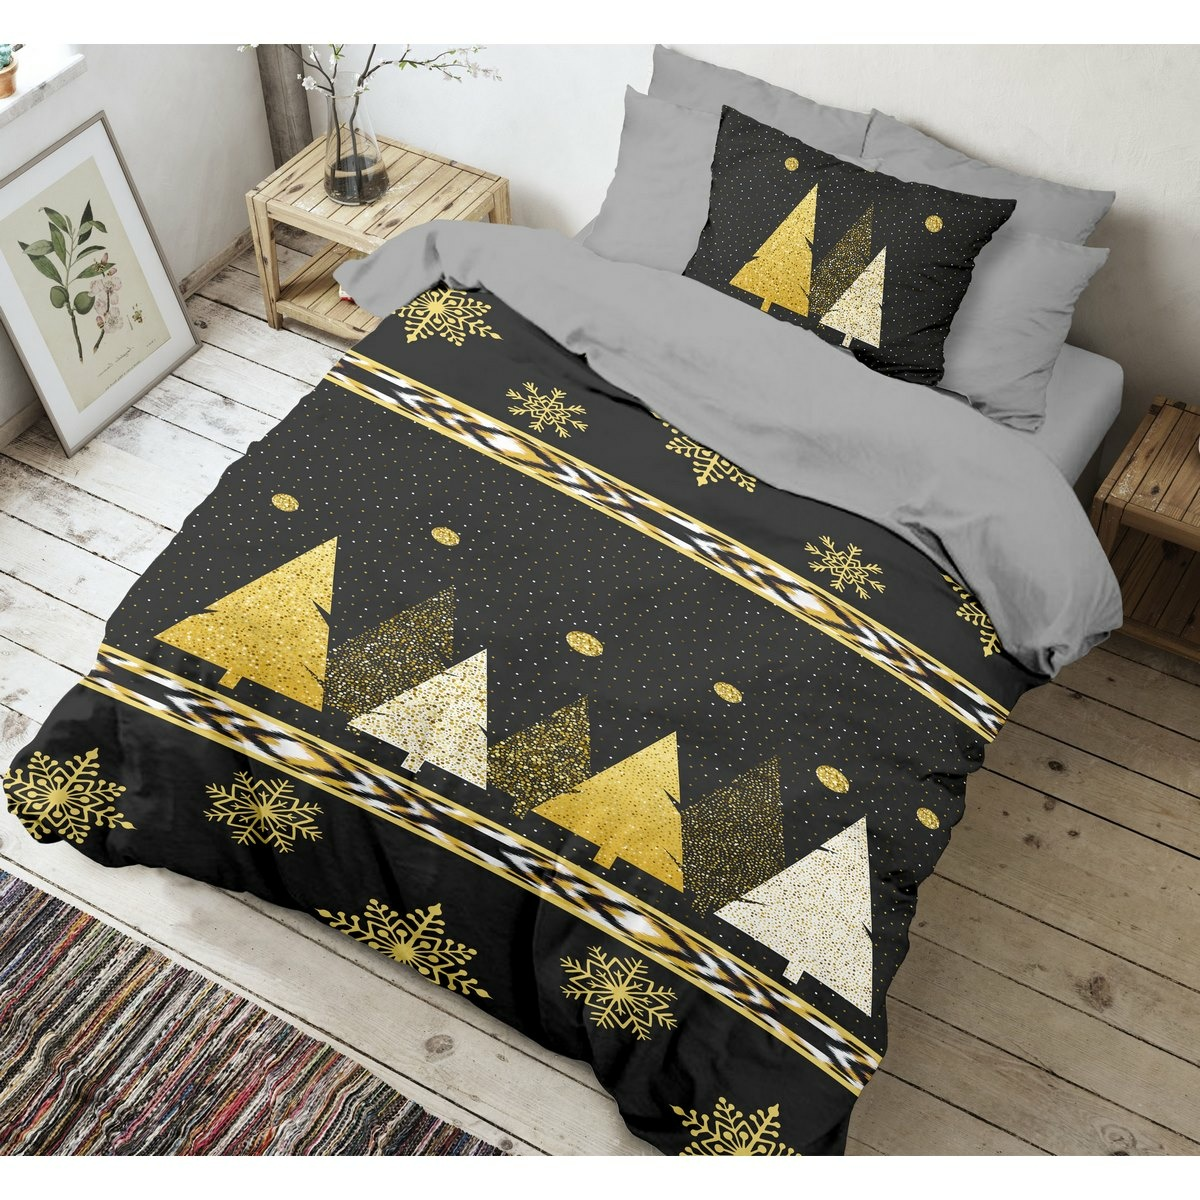 Kvalitex Bavlnené obliečky Silent night 3D, 140 x 200 cm, 70 x 90 cm